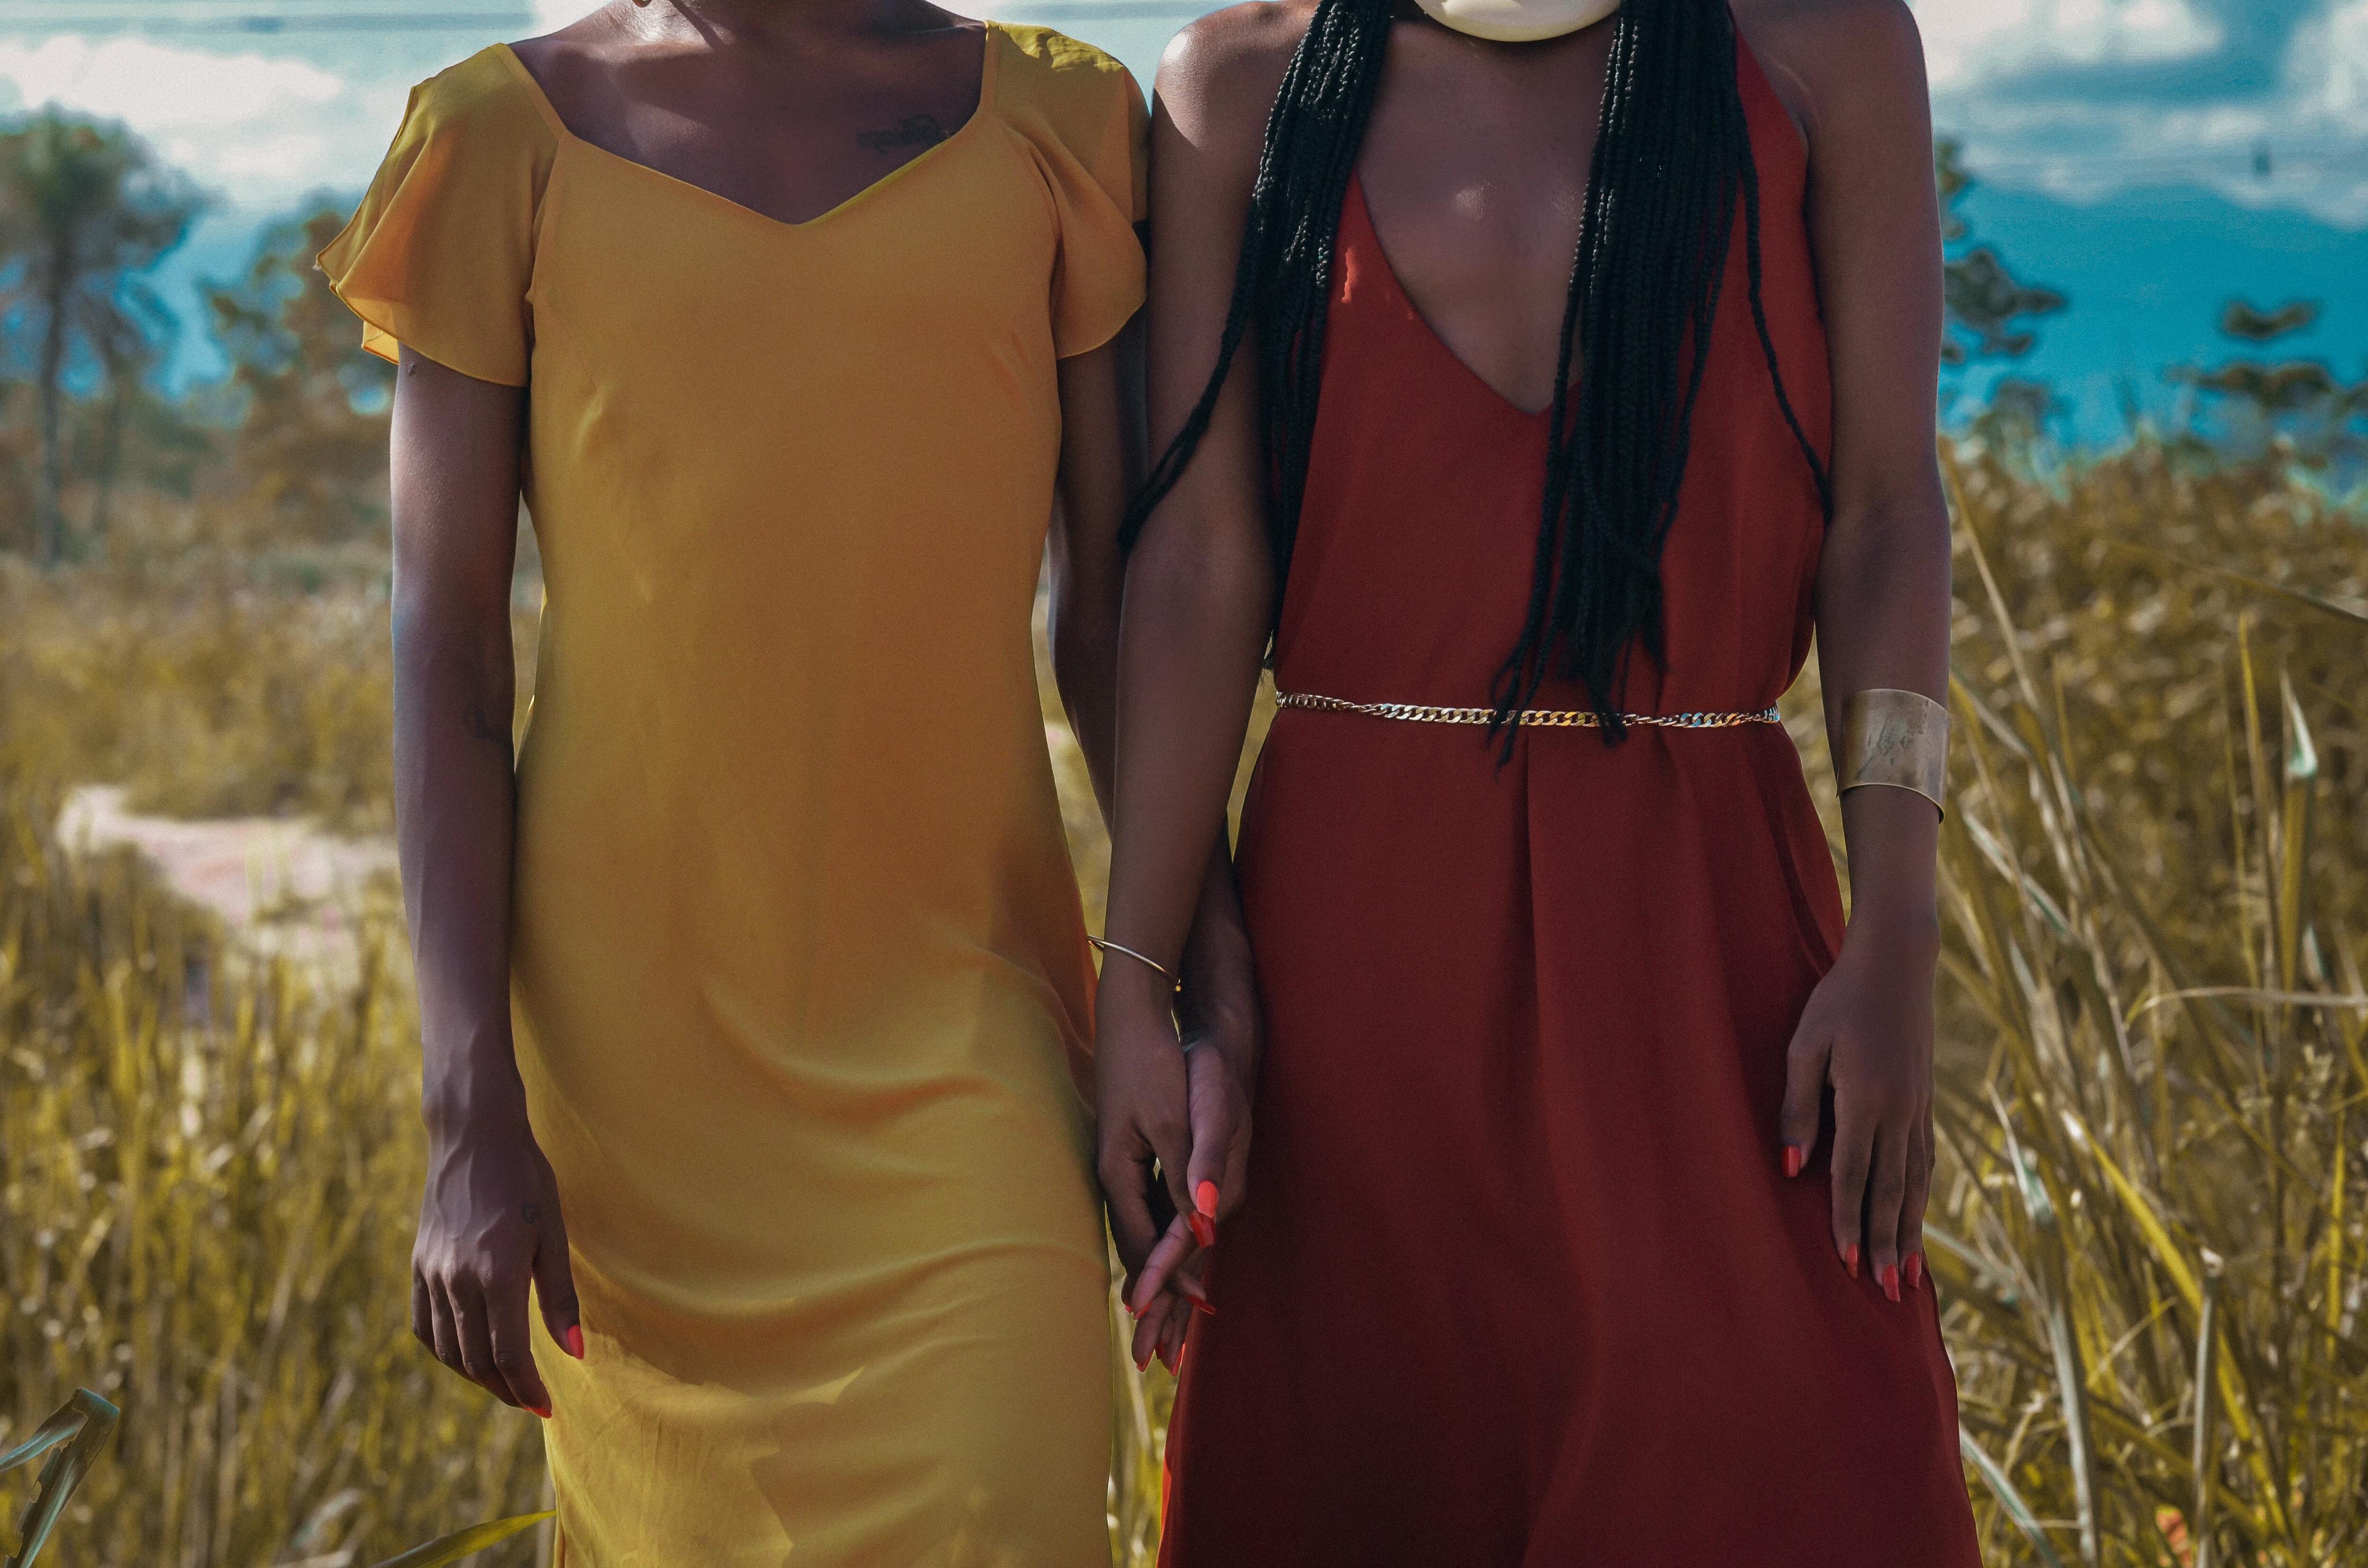 Mulheres que fotografam: Alessandra Lima